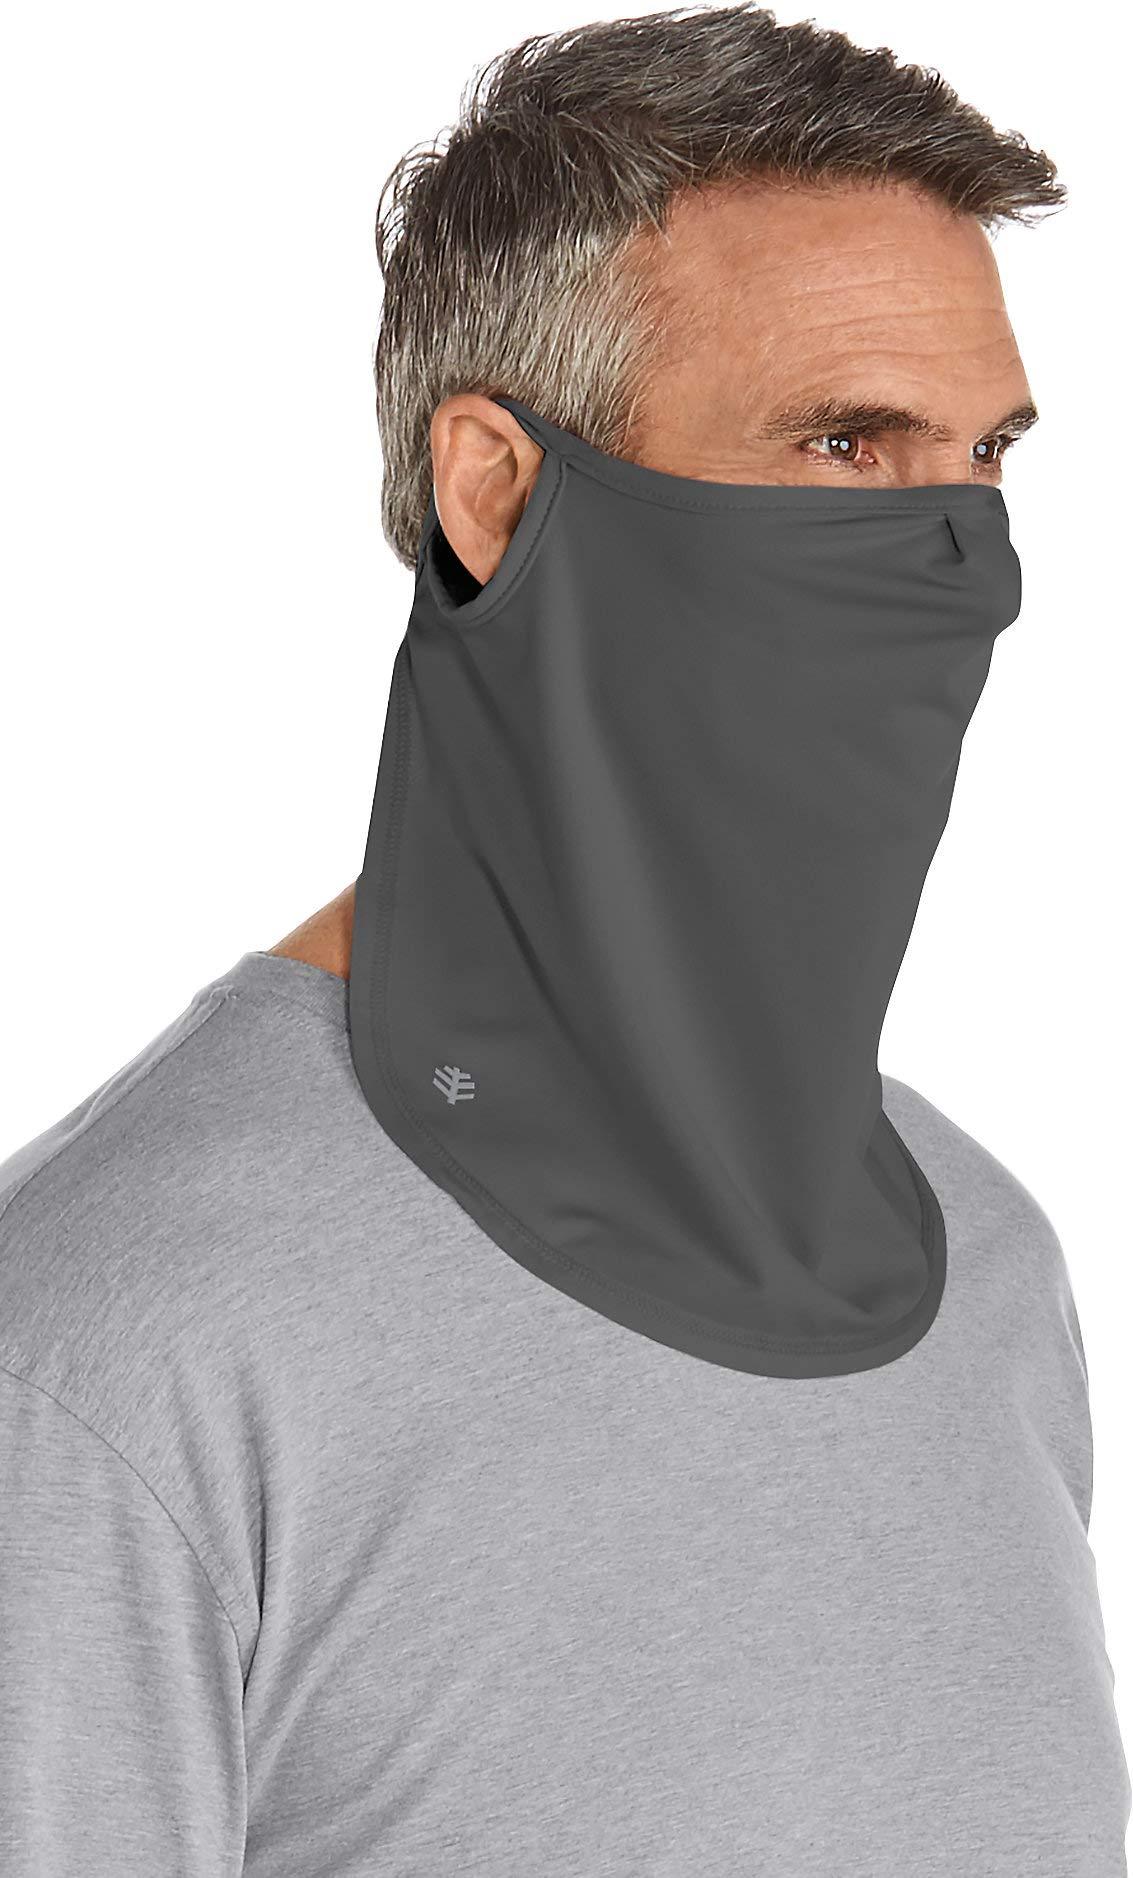 Coolibar UPF 50+ Unisex UV Face Mask - Sun Protective (Small/Medium- Charcoal)